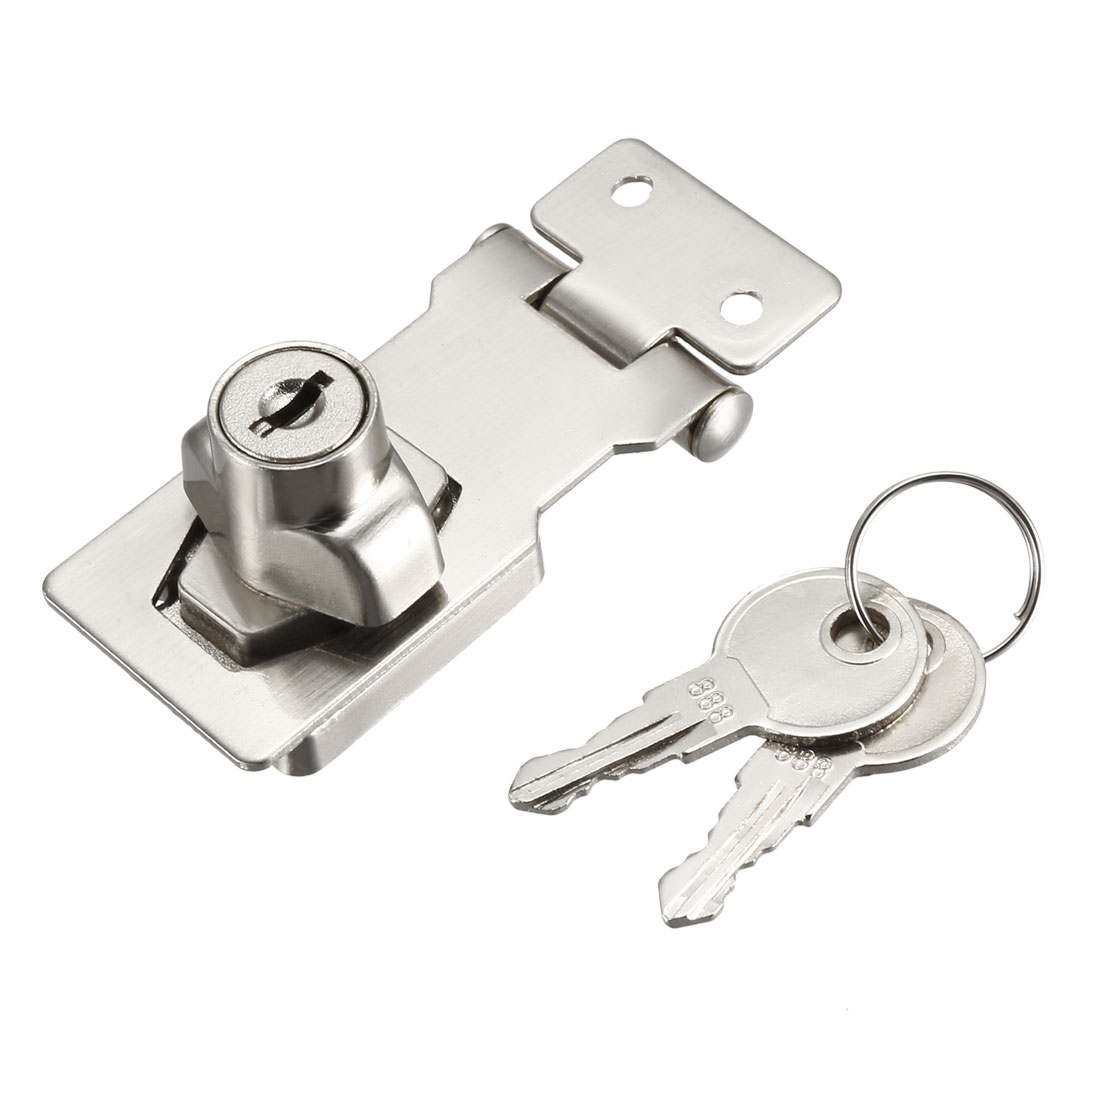 Keyed Hasp Lock 80mm Twist Knob Keyed Locking Hasp Keyed Alike Silver Tone